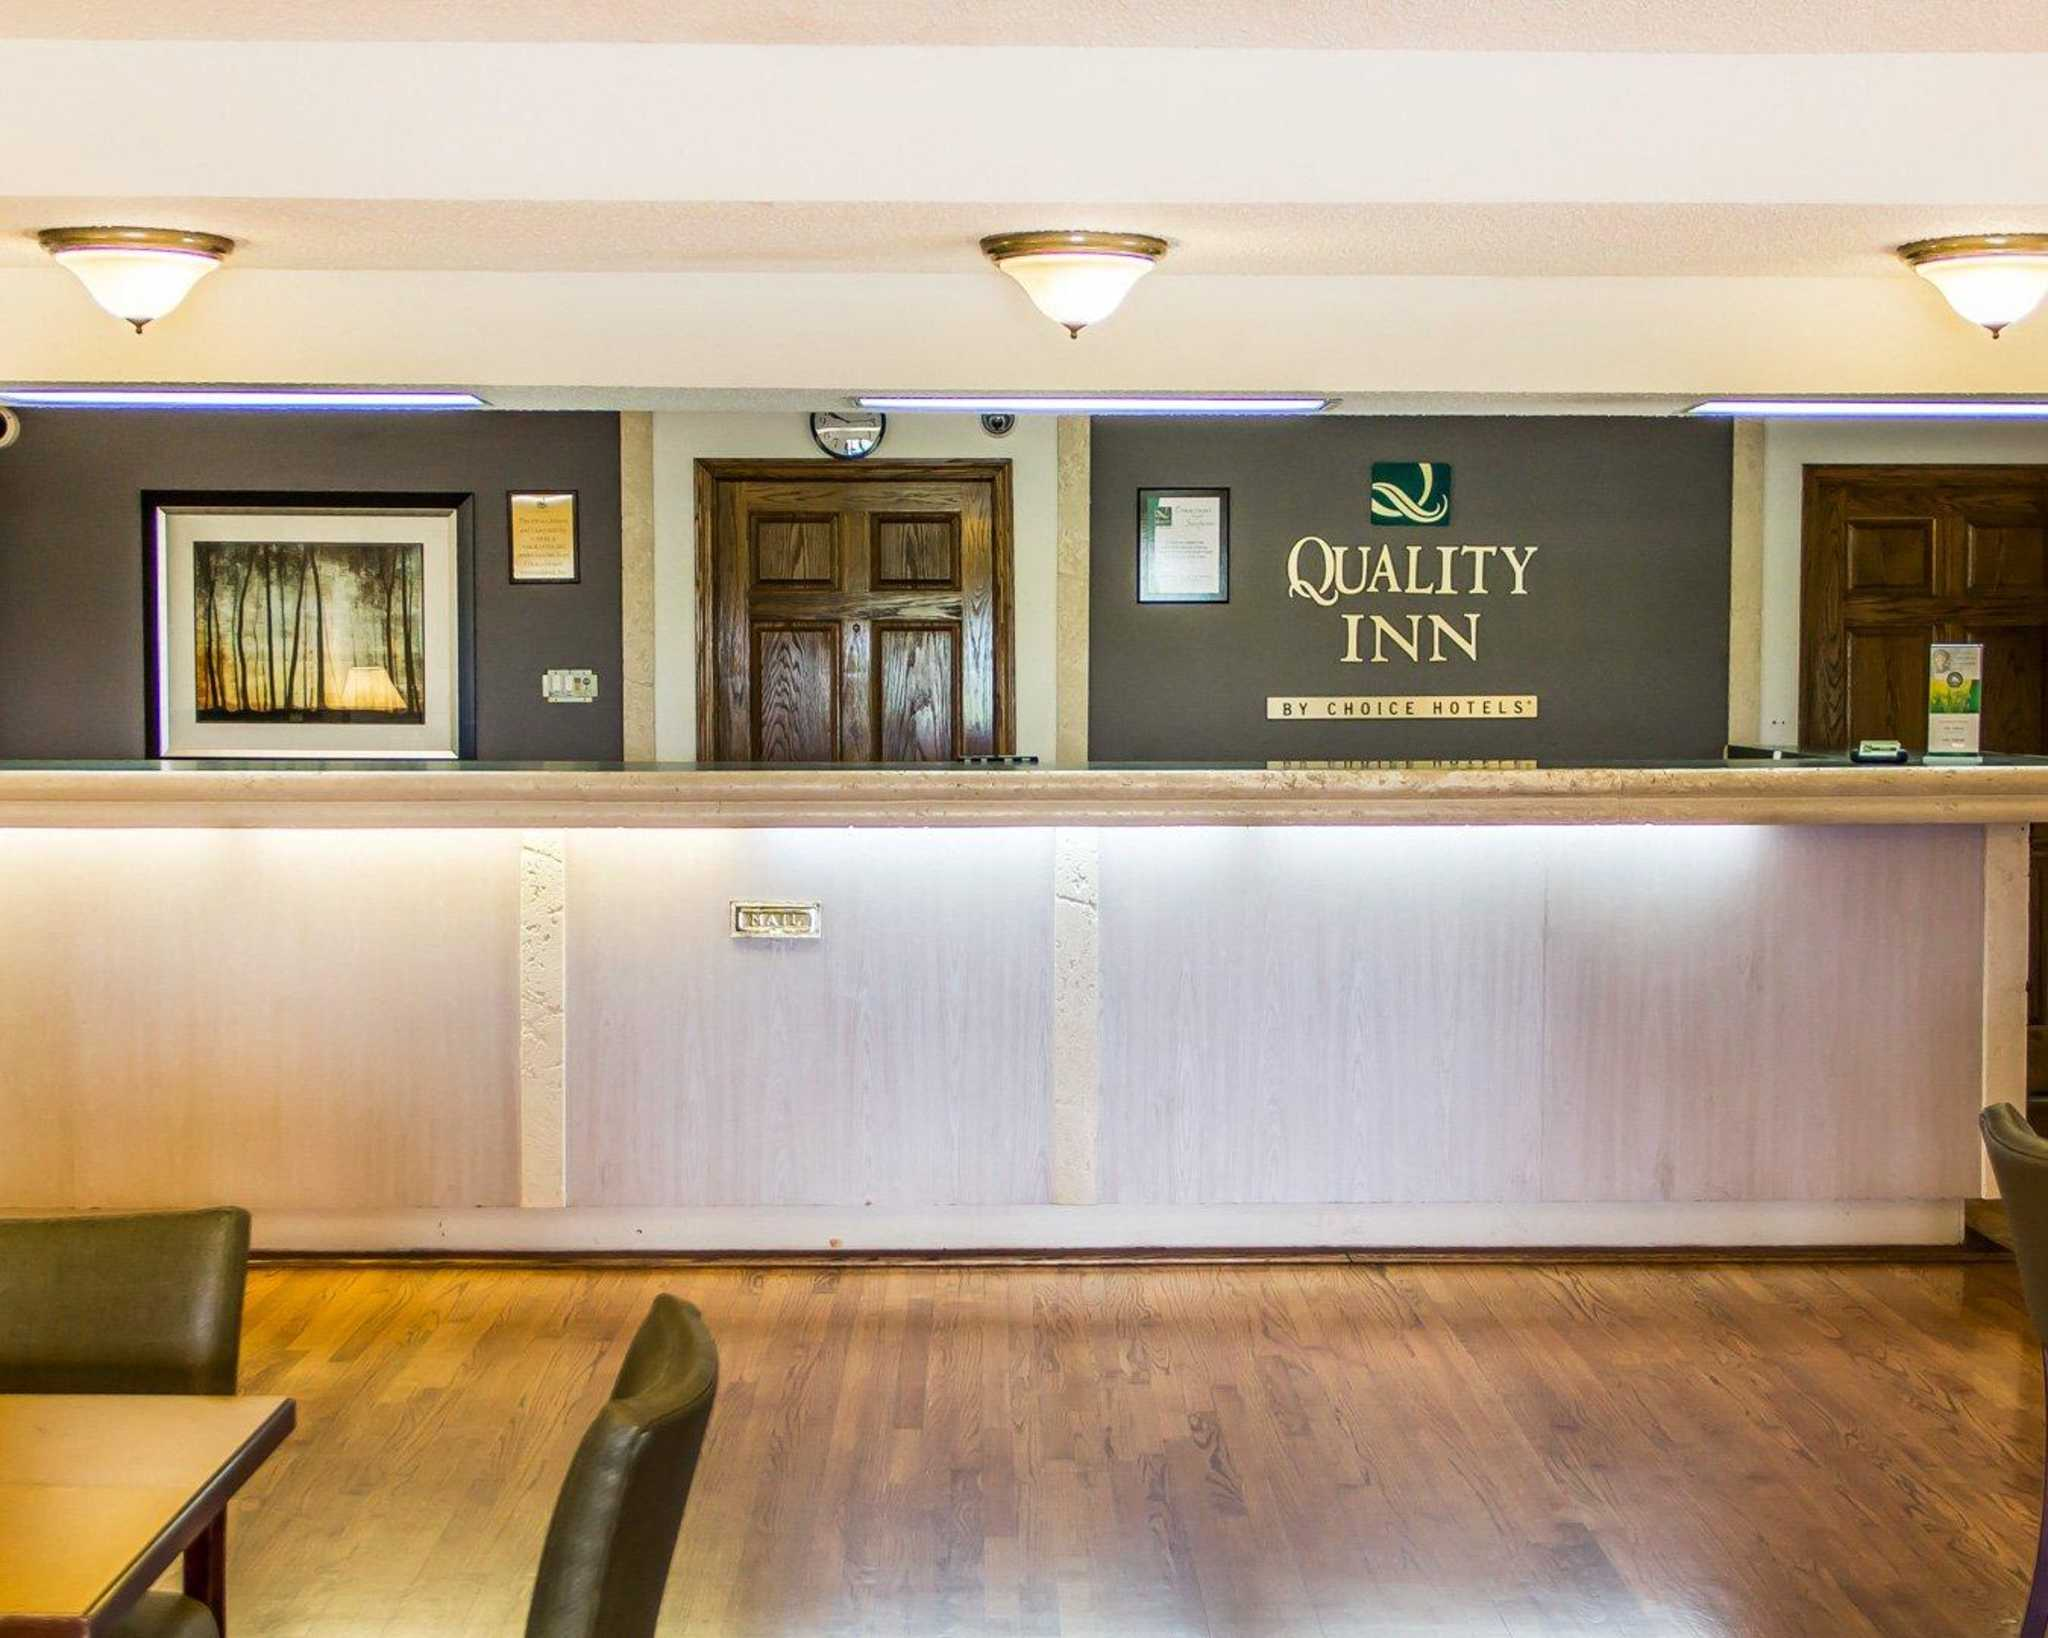 Quality Inn image 15